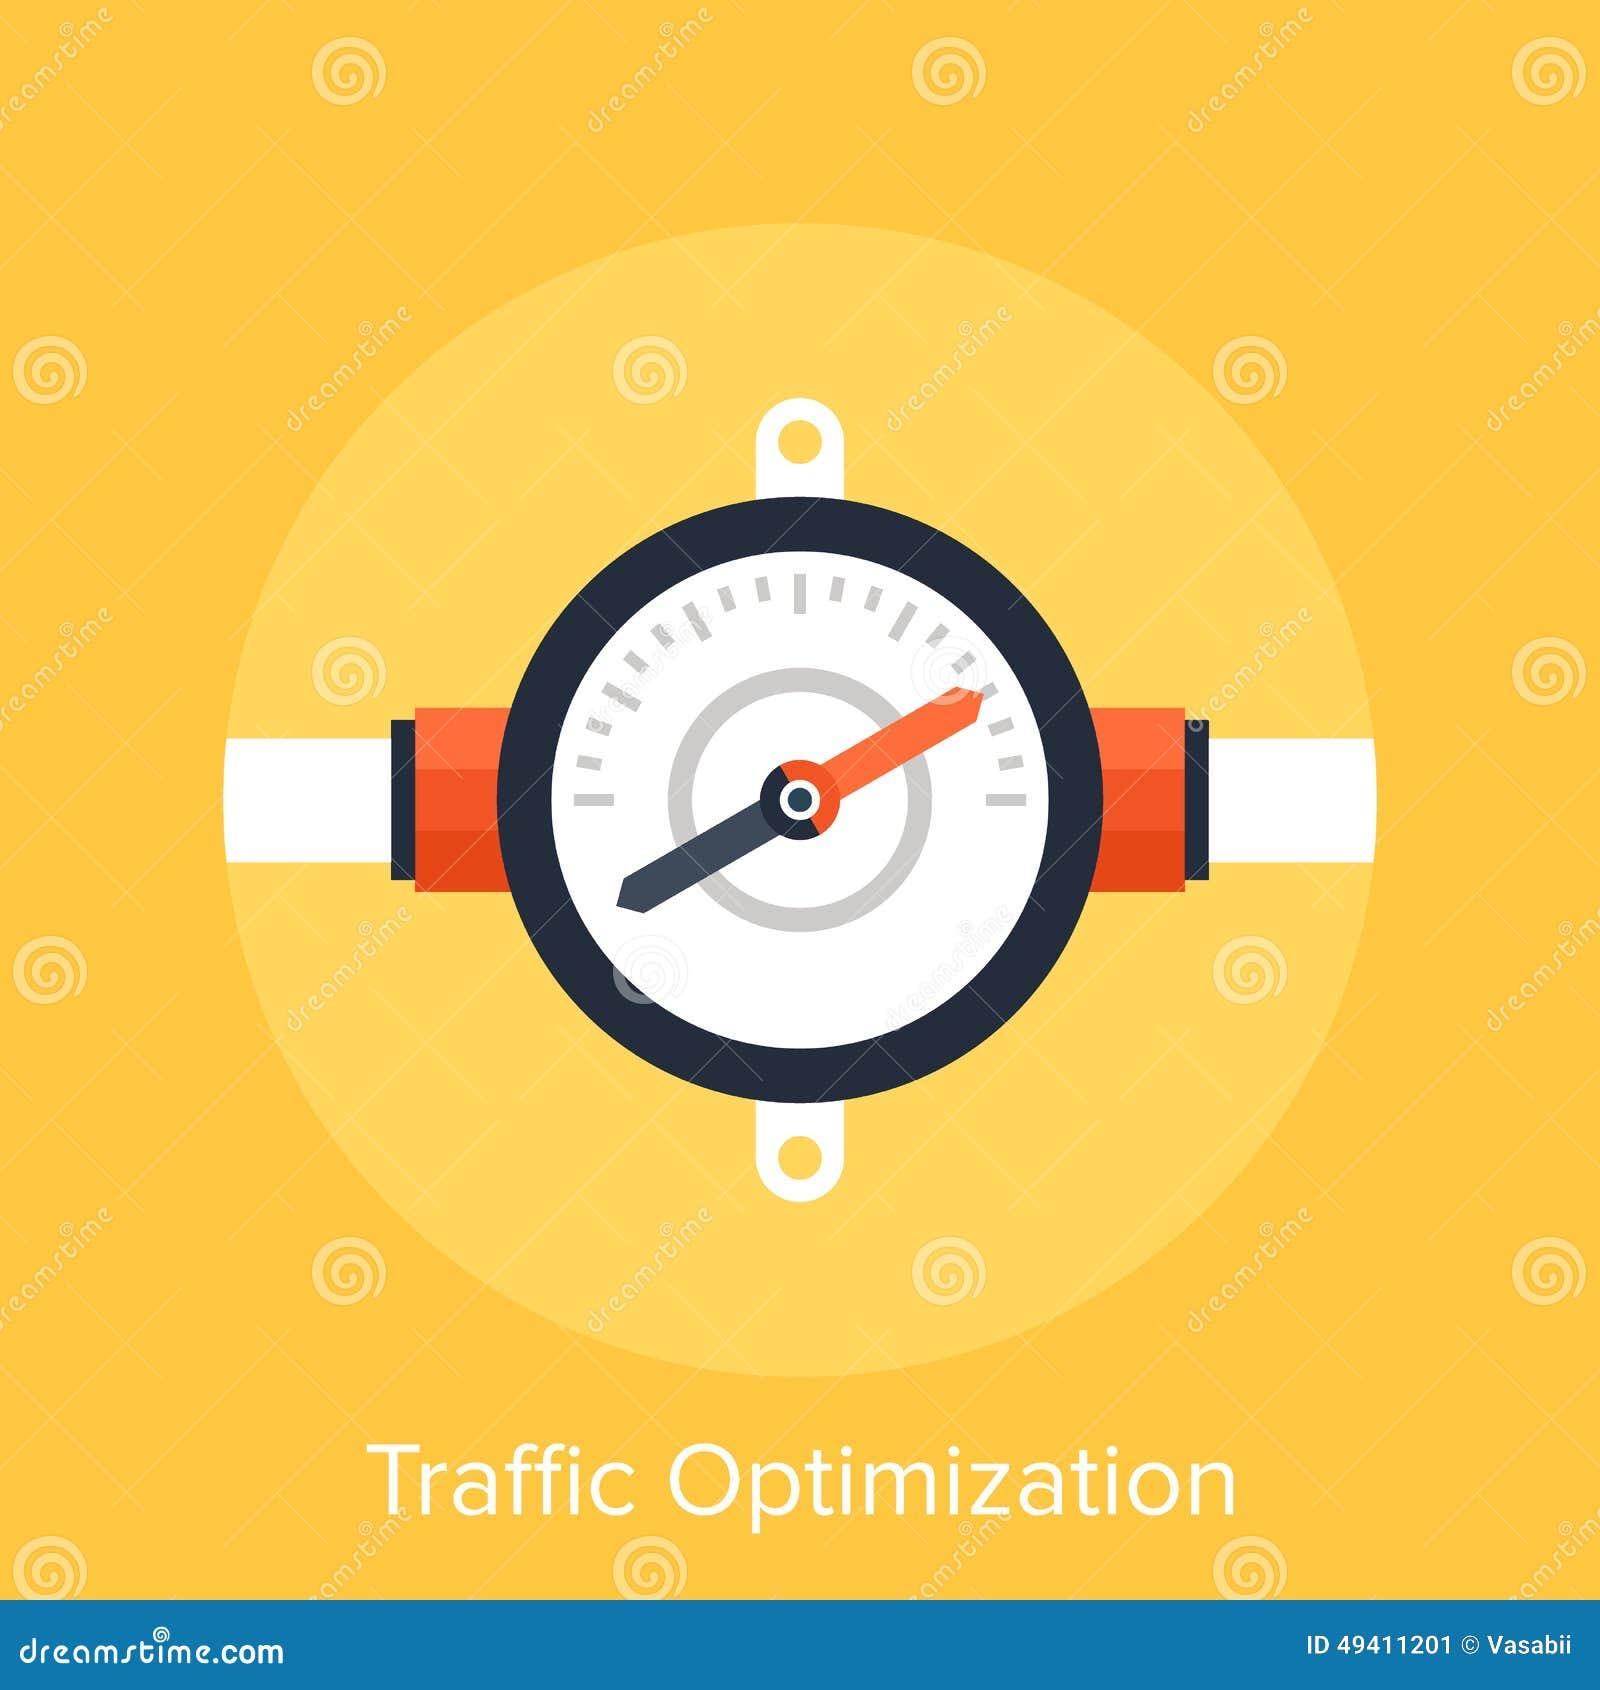 Download Verkehrs-Optimierung stockbild. Bild von geschäft, technologie - 49411201